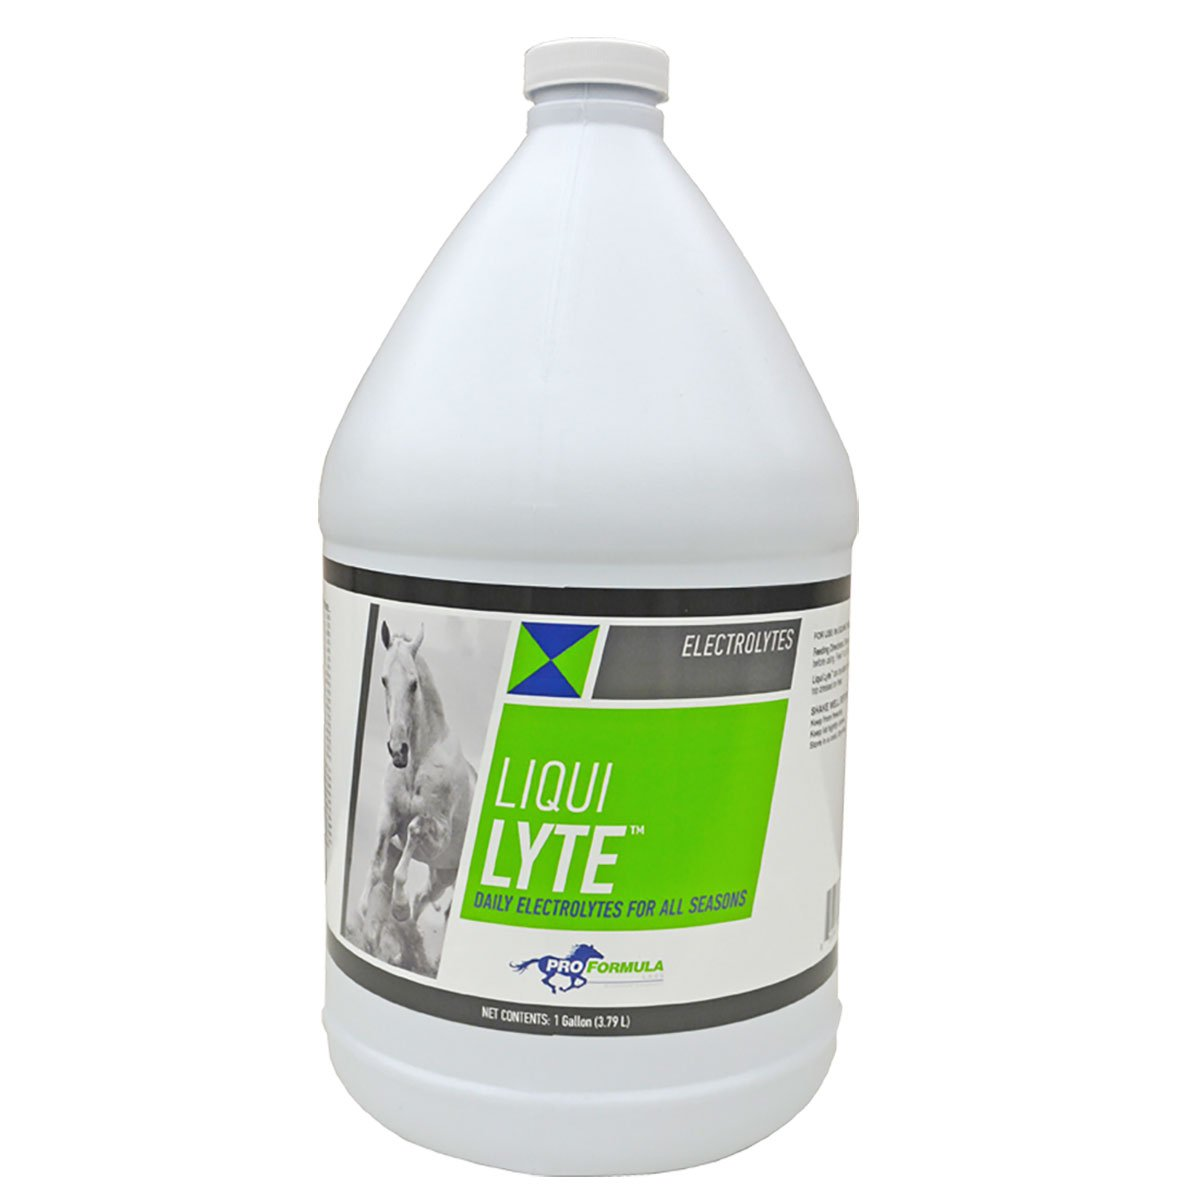 Pro Formula Liqui Lyte Electrolytes Gallon by Pro Formula